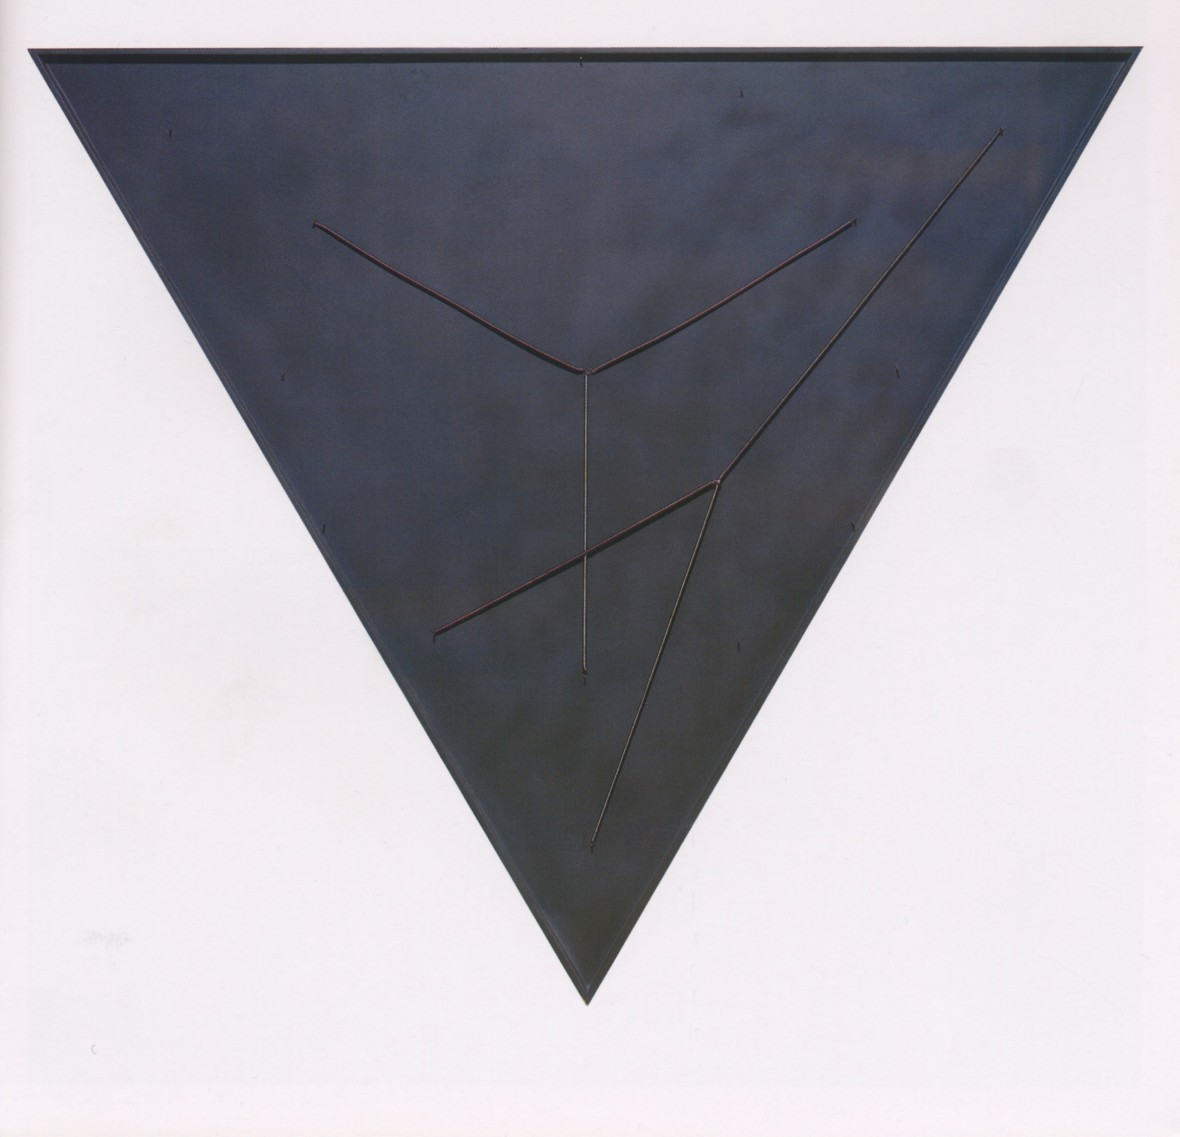 <p><b>Gianni Colombo,</b><i>Spazio elastico (Elastic Space)</i>, 1978<i><br /></i></p>